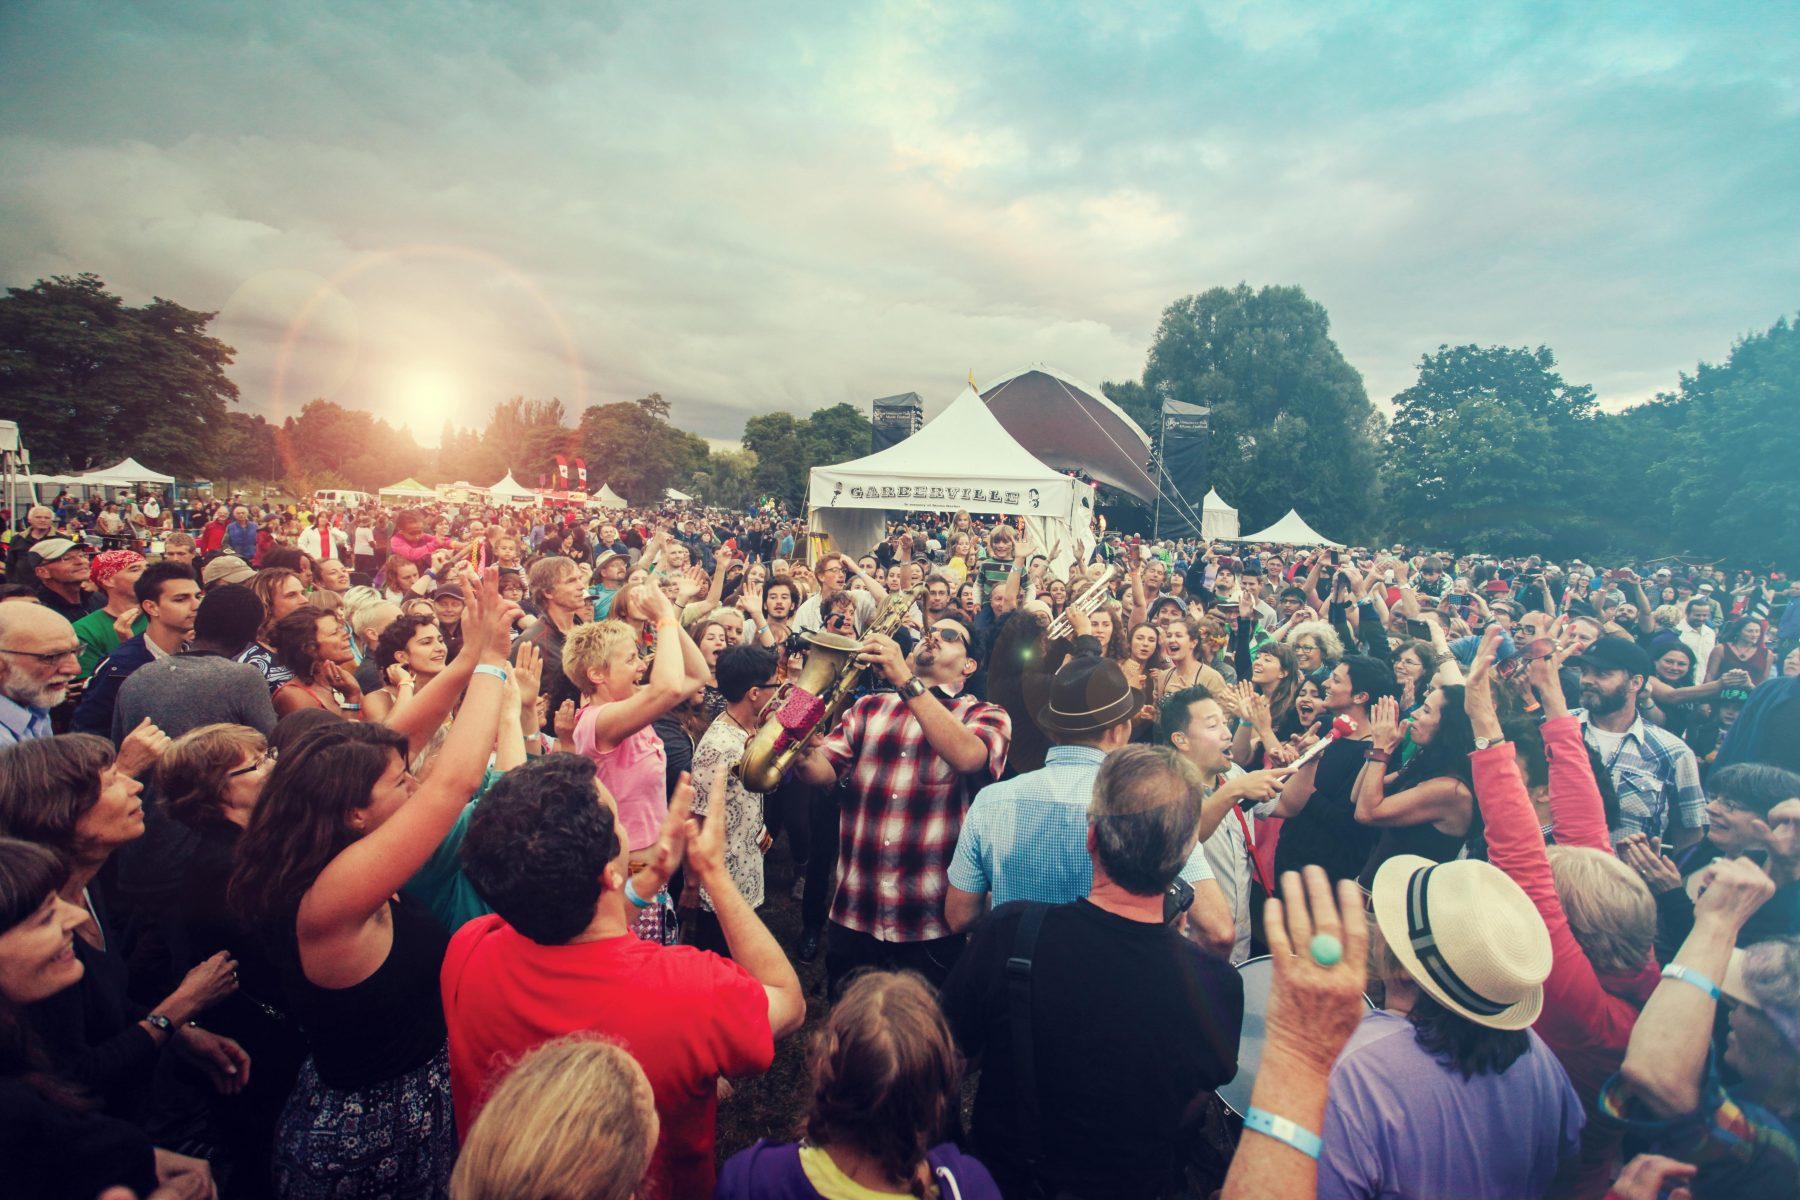 Vancouver Folk Music Festival/David Niddrie